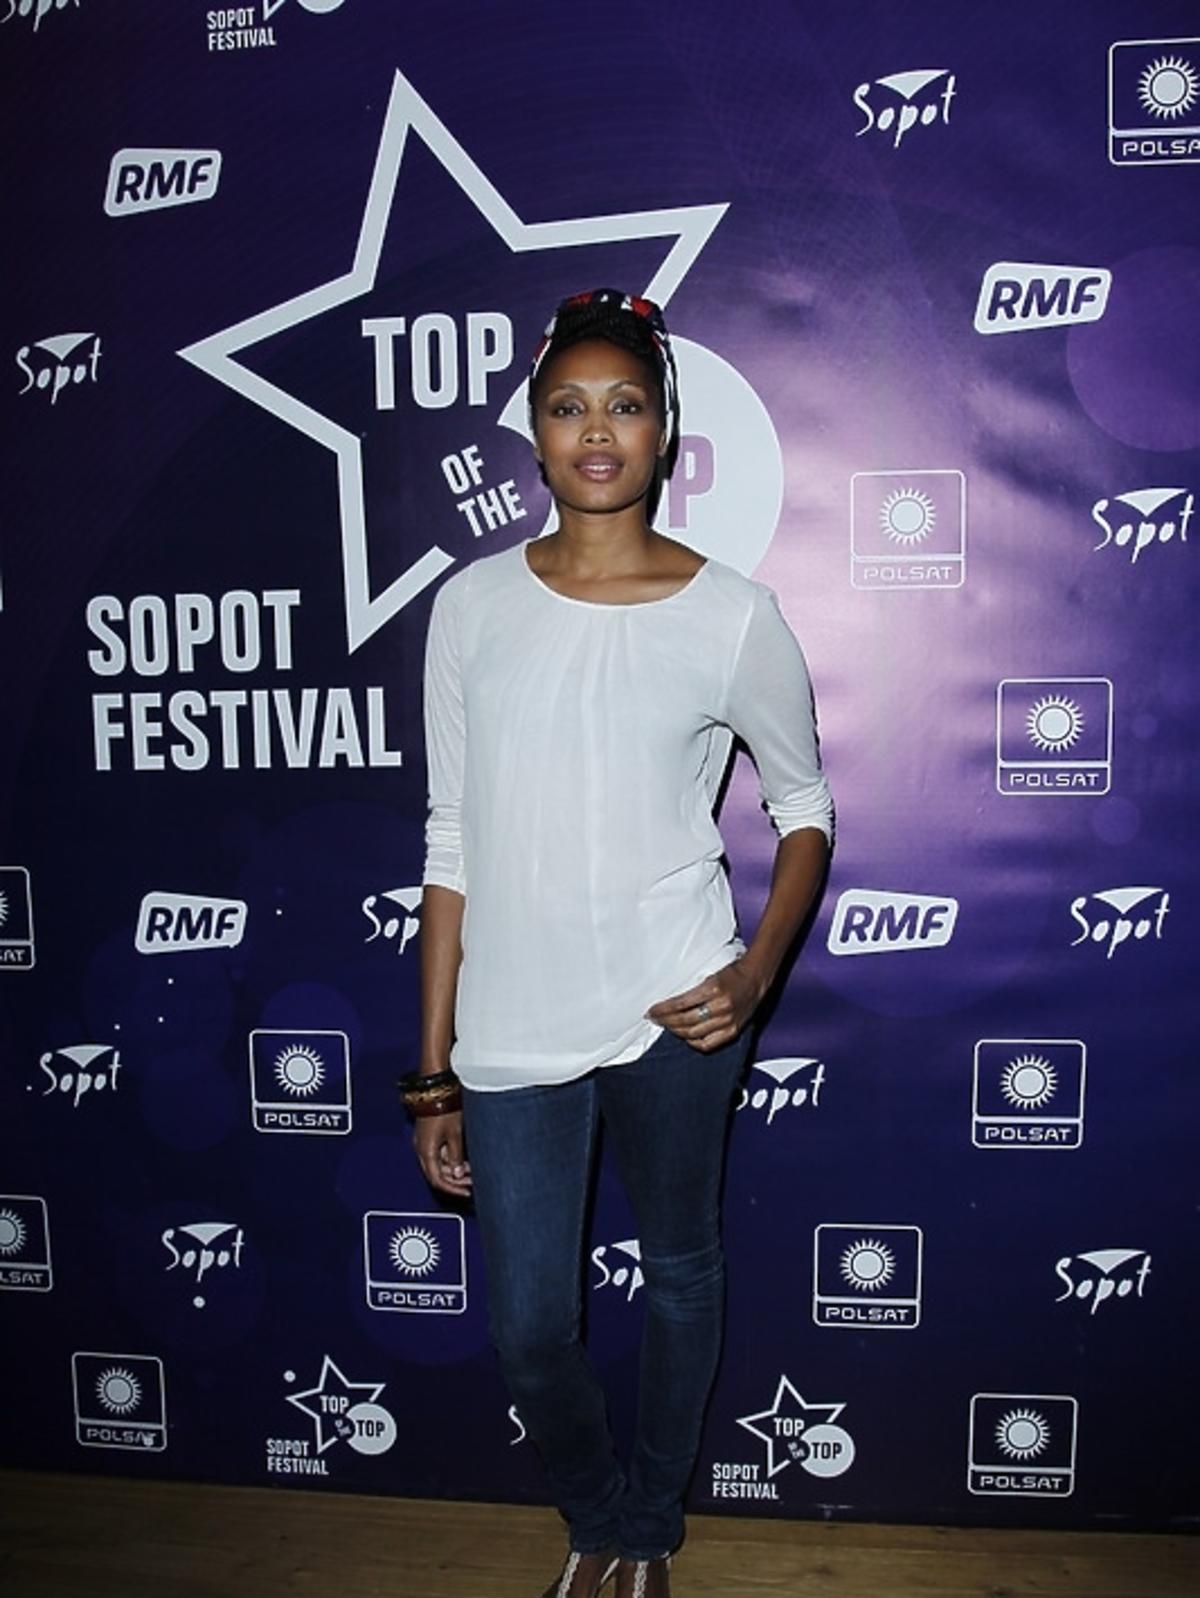 Imany podczas konferencji Sopot Top of the Top Festival 2013